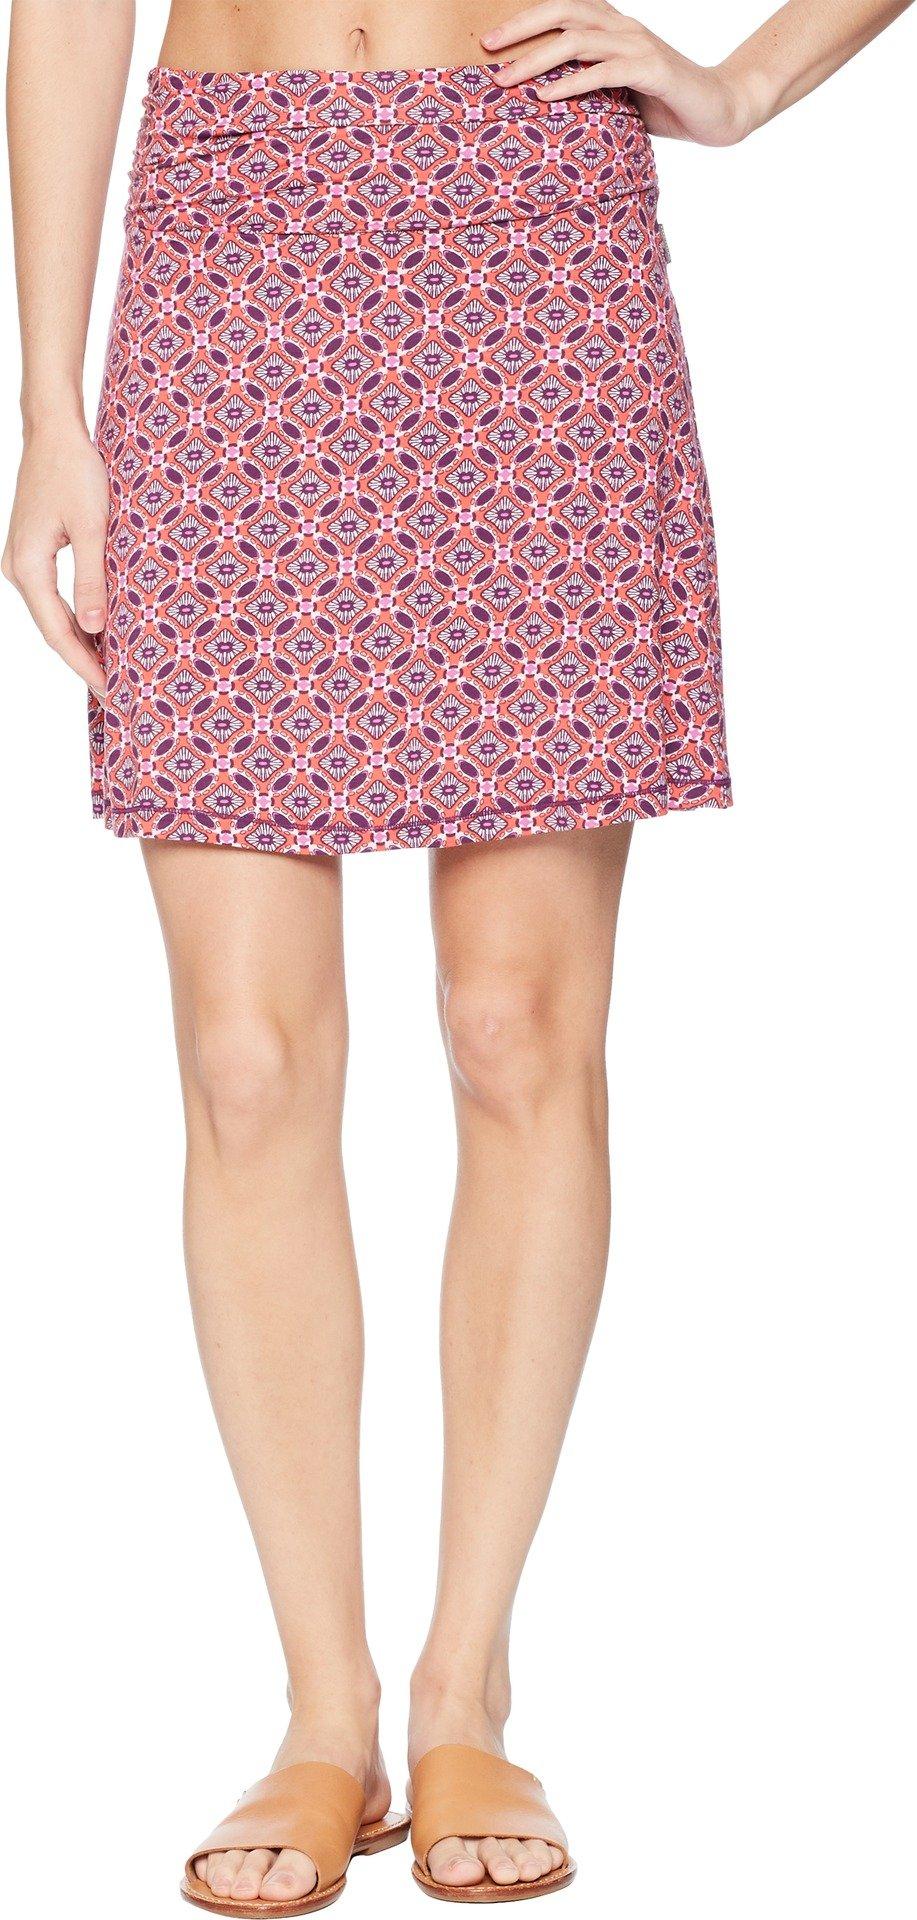 White Sierra Women's Tangier Mosaic Skirt, Watermelon, Medium